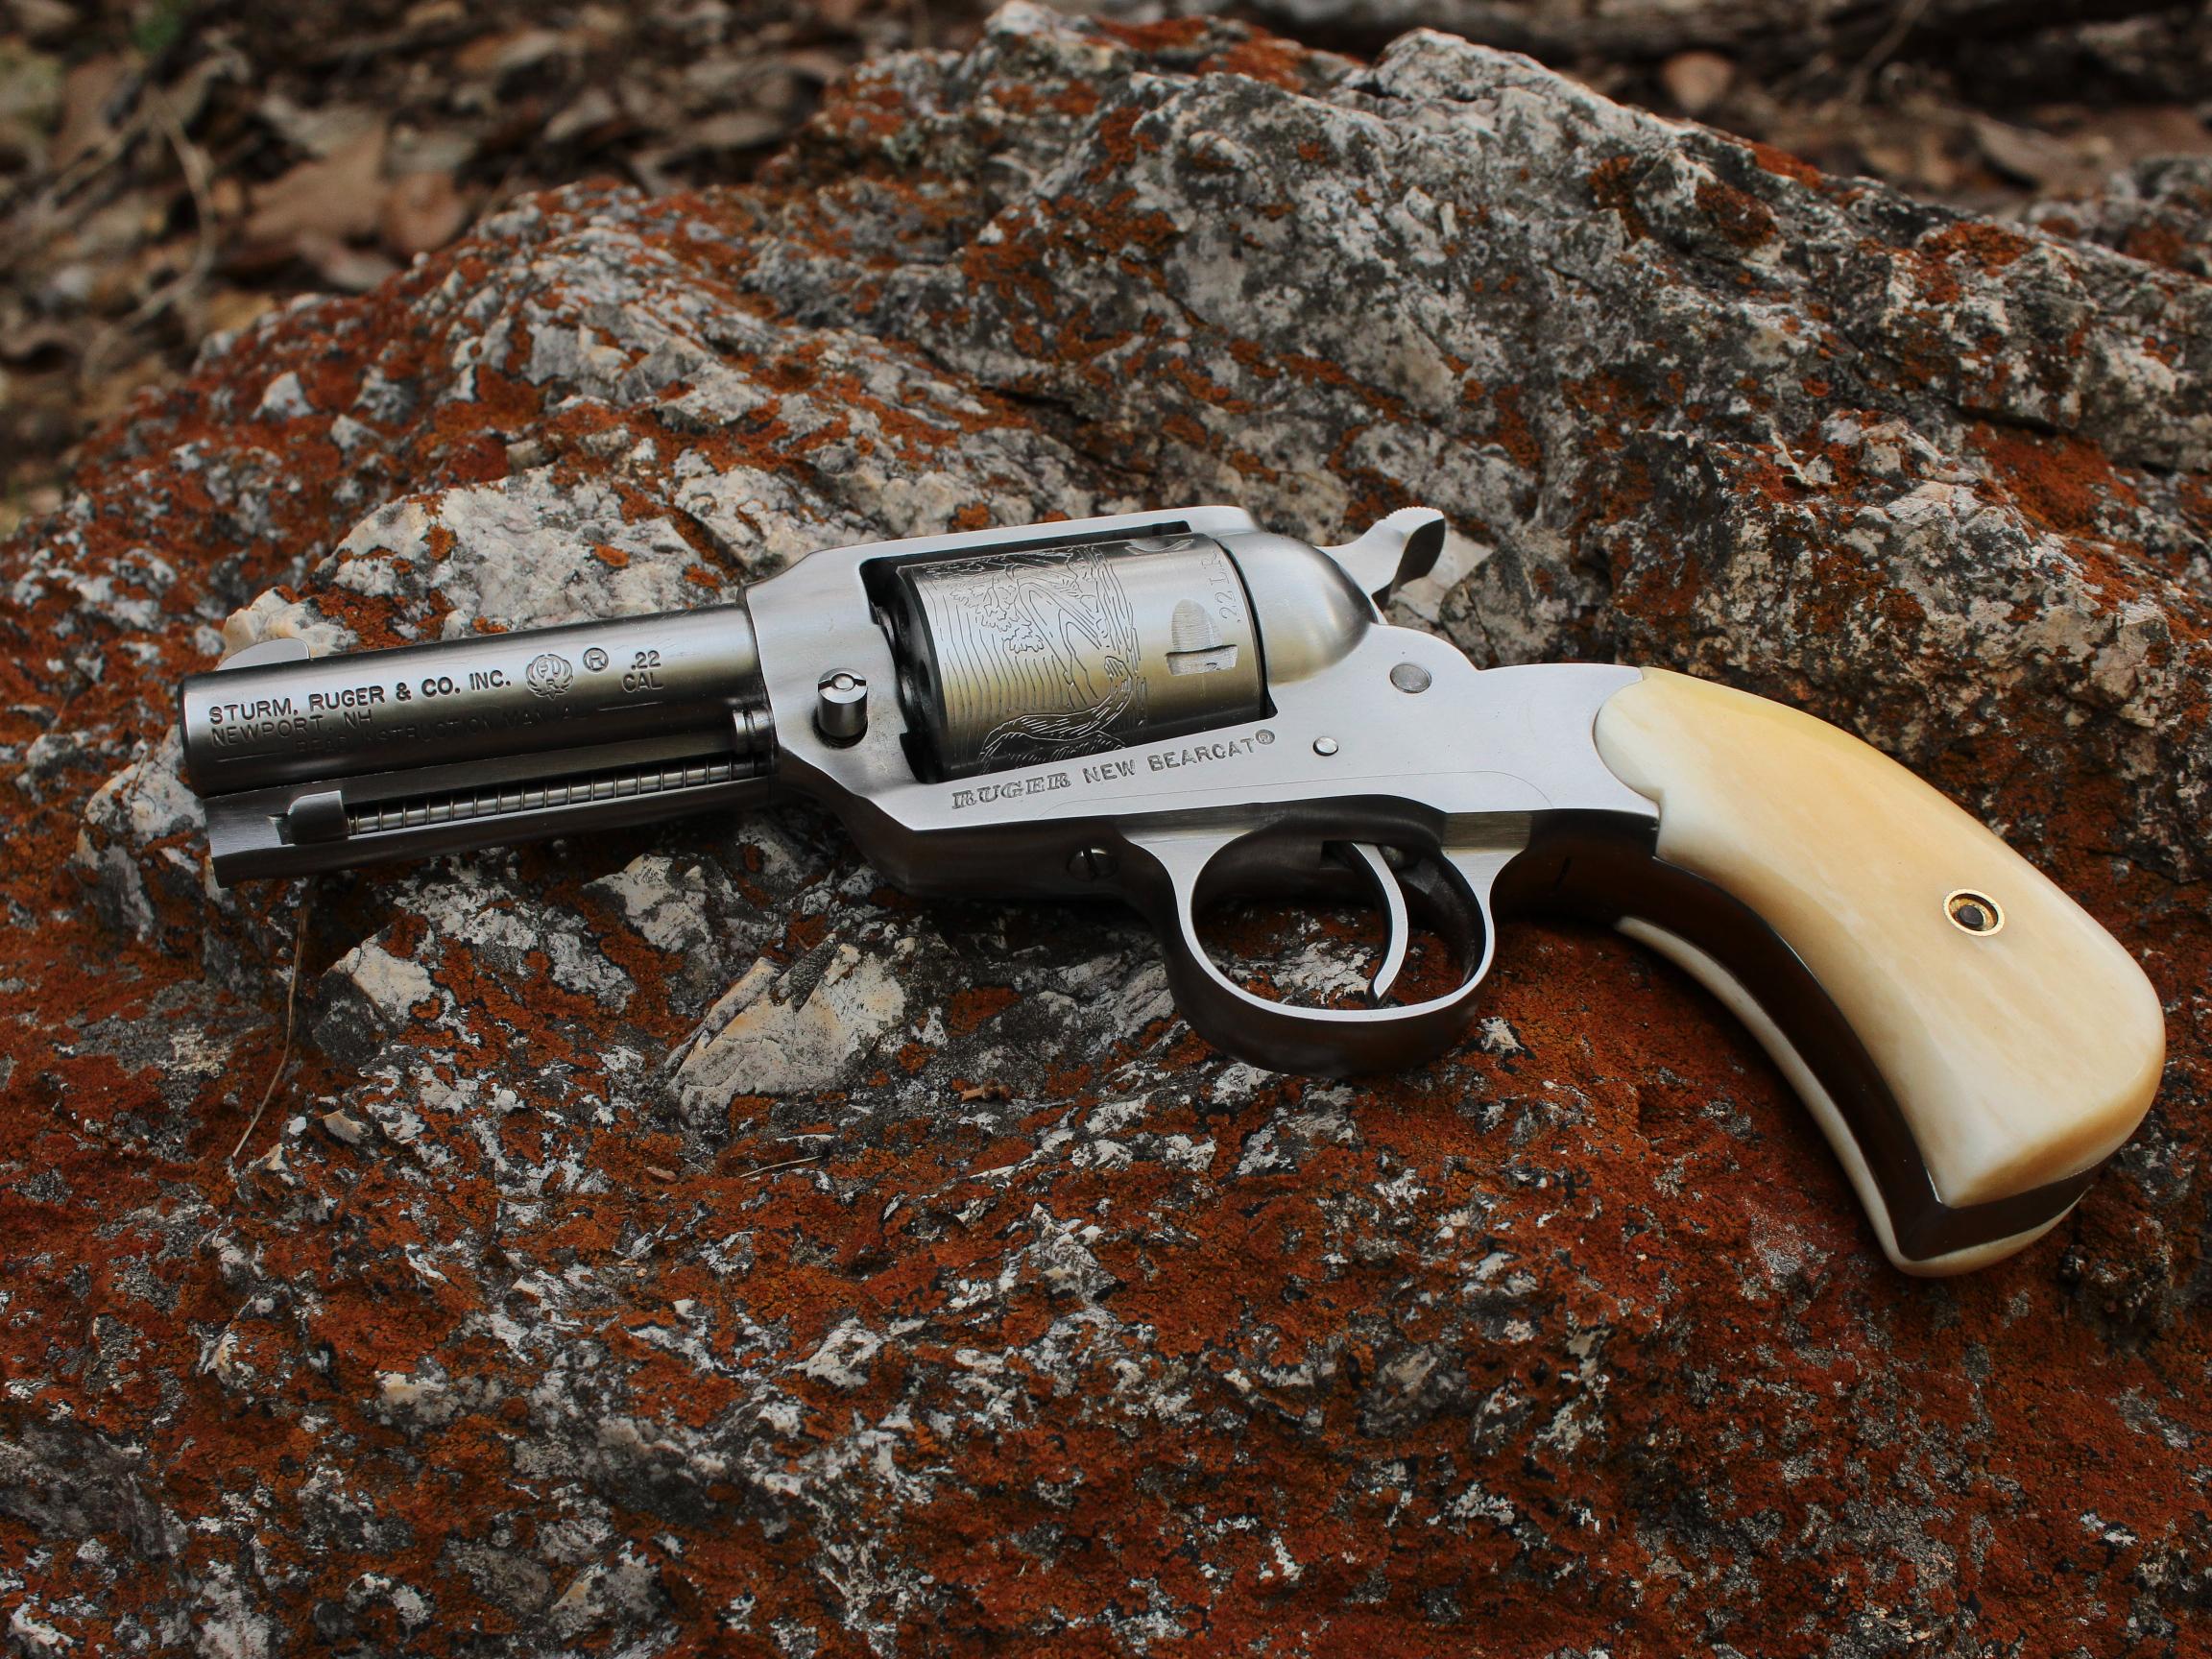 Gun Photography Ruger 2304x1728